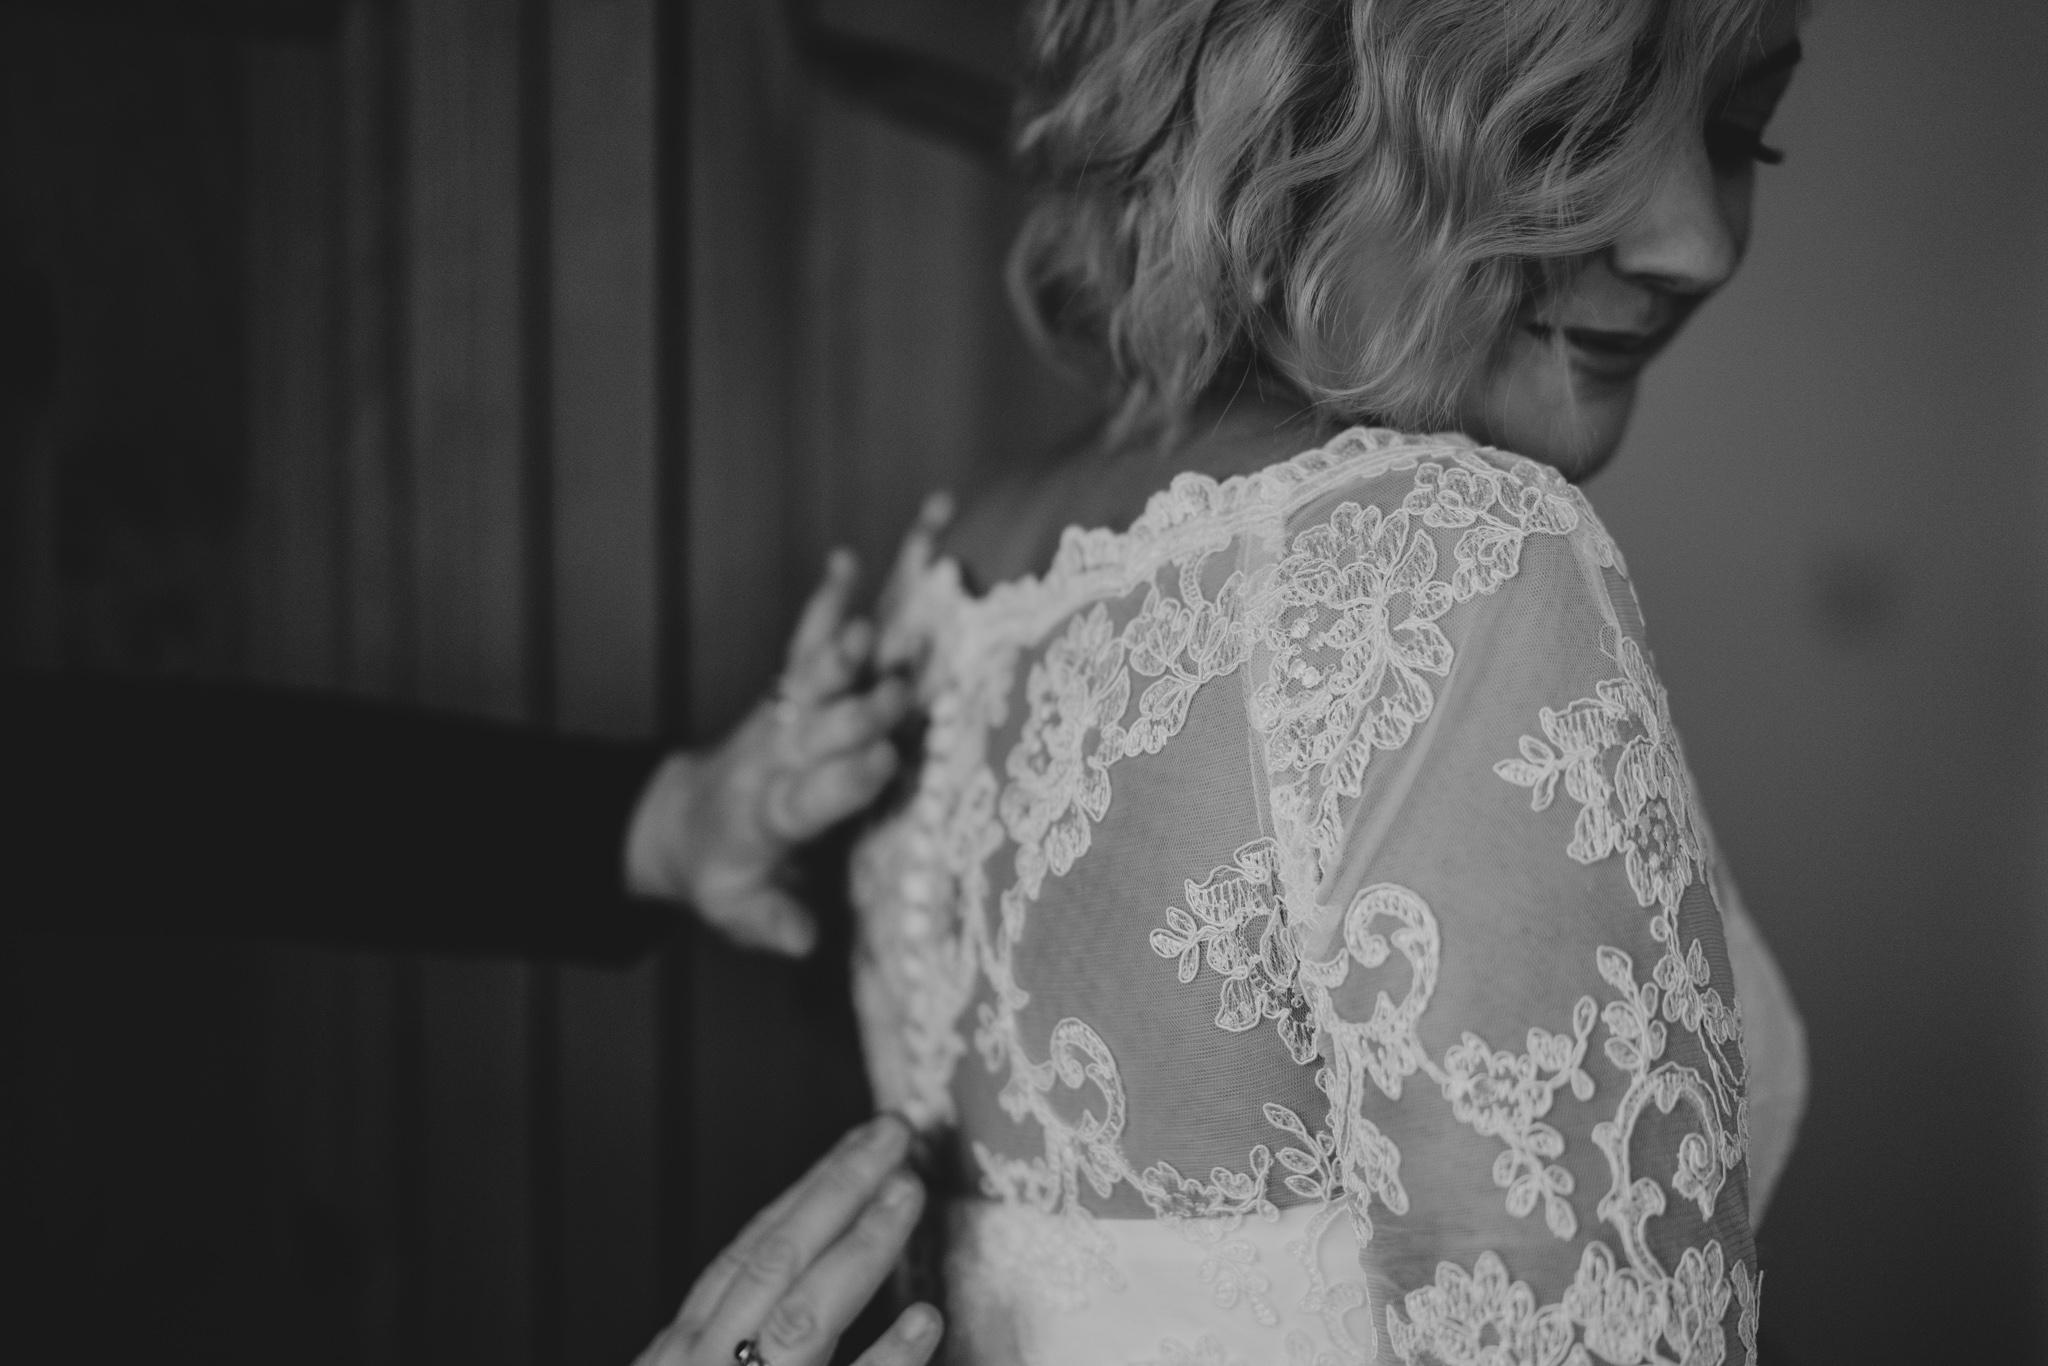 rhia-james-rustic-crabbs-barn-vintage-50s-retro-wedding-grace-elizabeth-colchester-essex-alternative-relaxed-wedding-family-photography-devon-suffolk-norfolk-essex (30 of 138).jpg